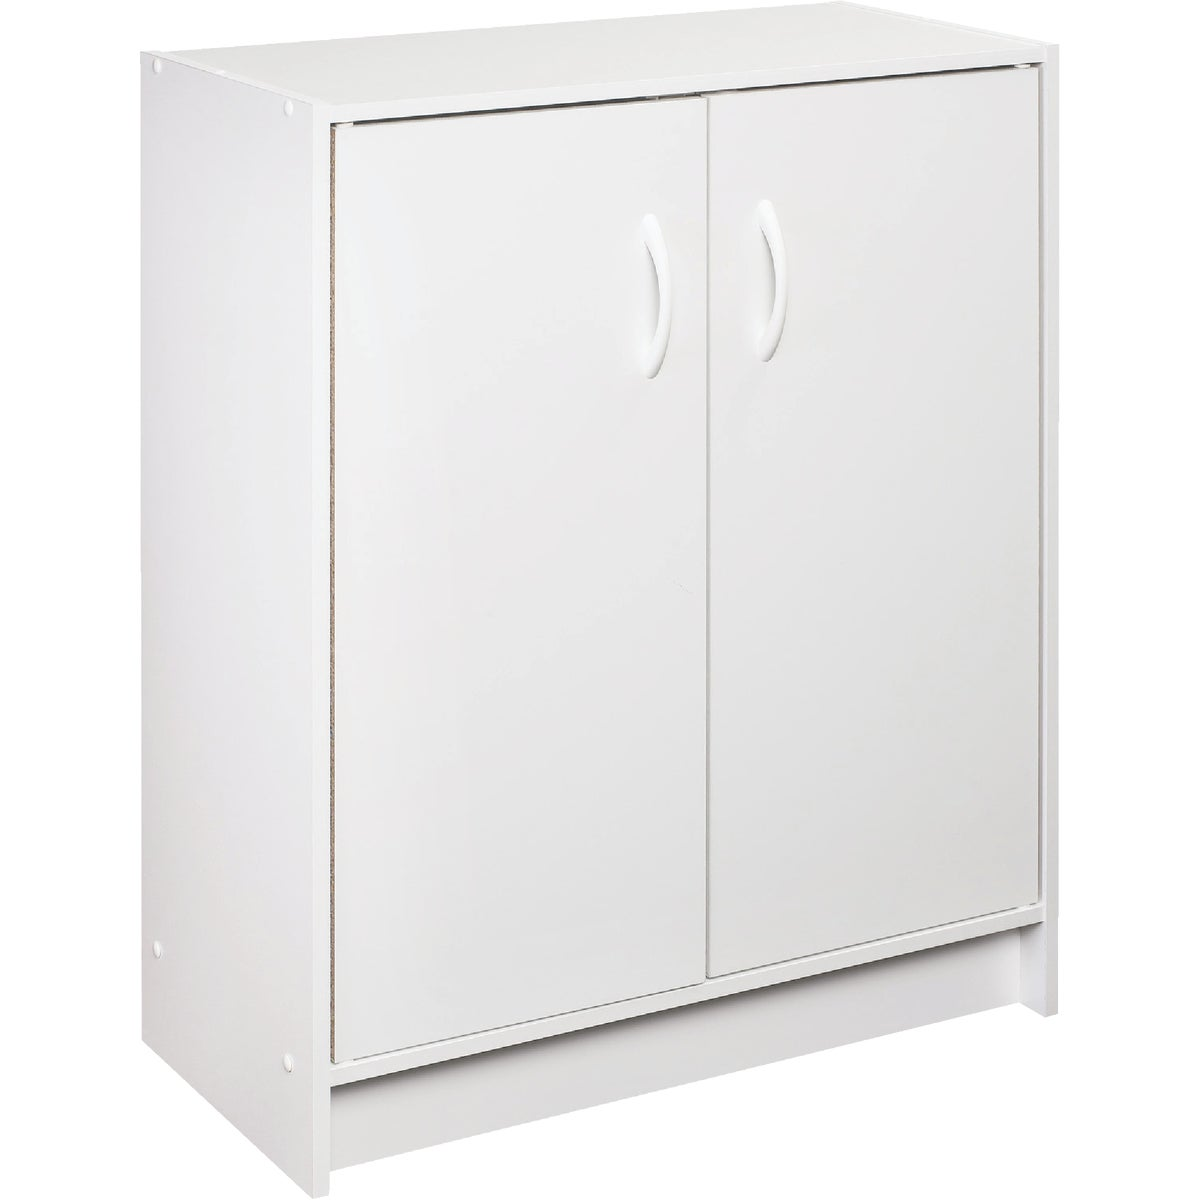 WHT 2 DOOR ORGANIZER - 898200 by Closetmaid